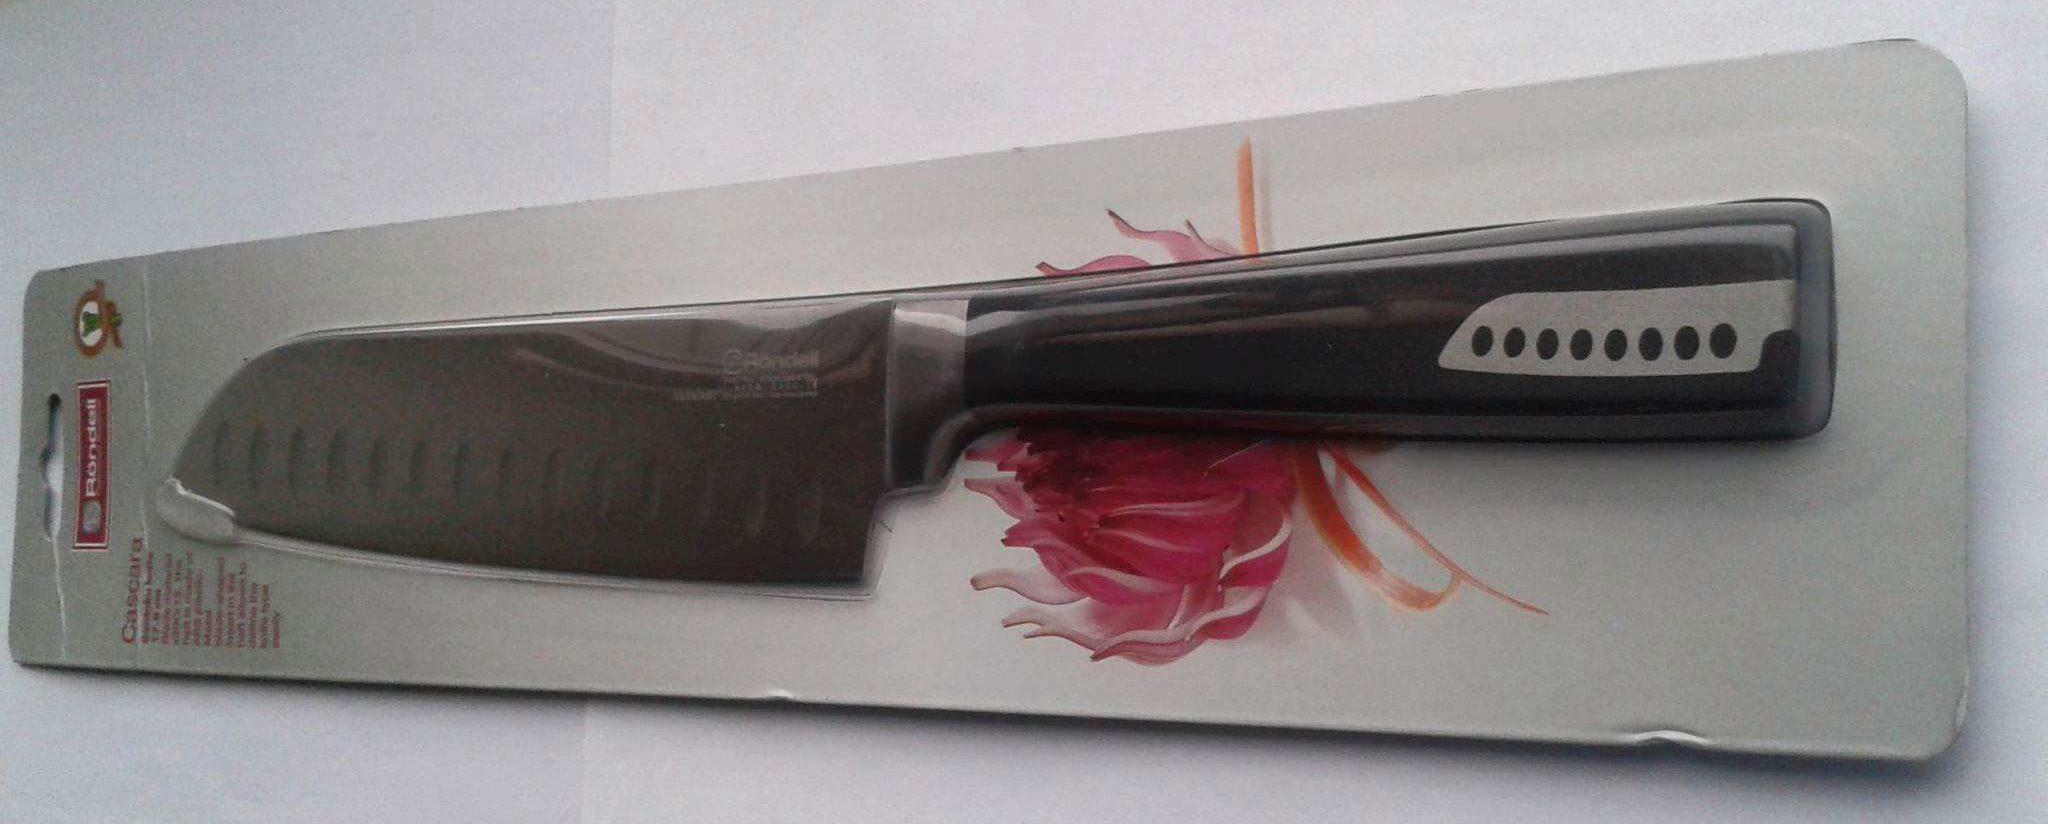 RD - 687 Нож Santoku Cascara 17,8 см